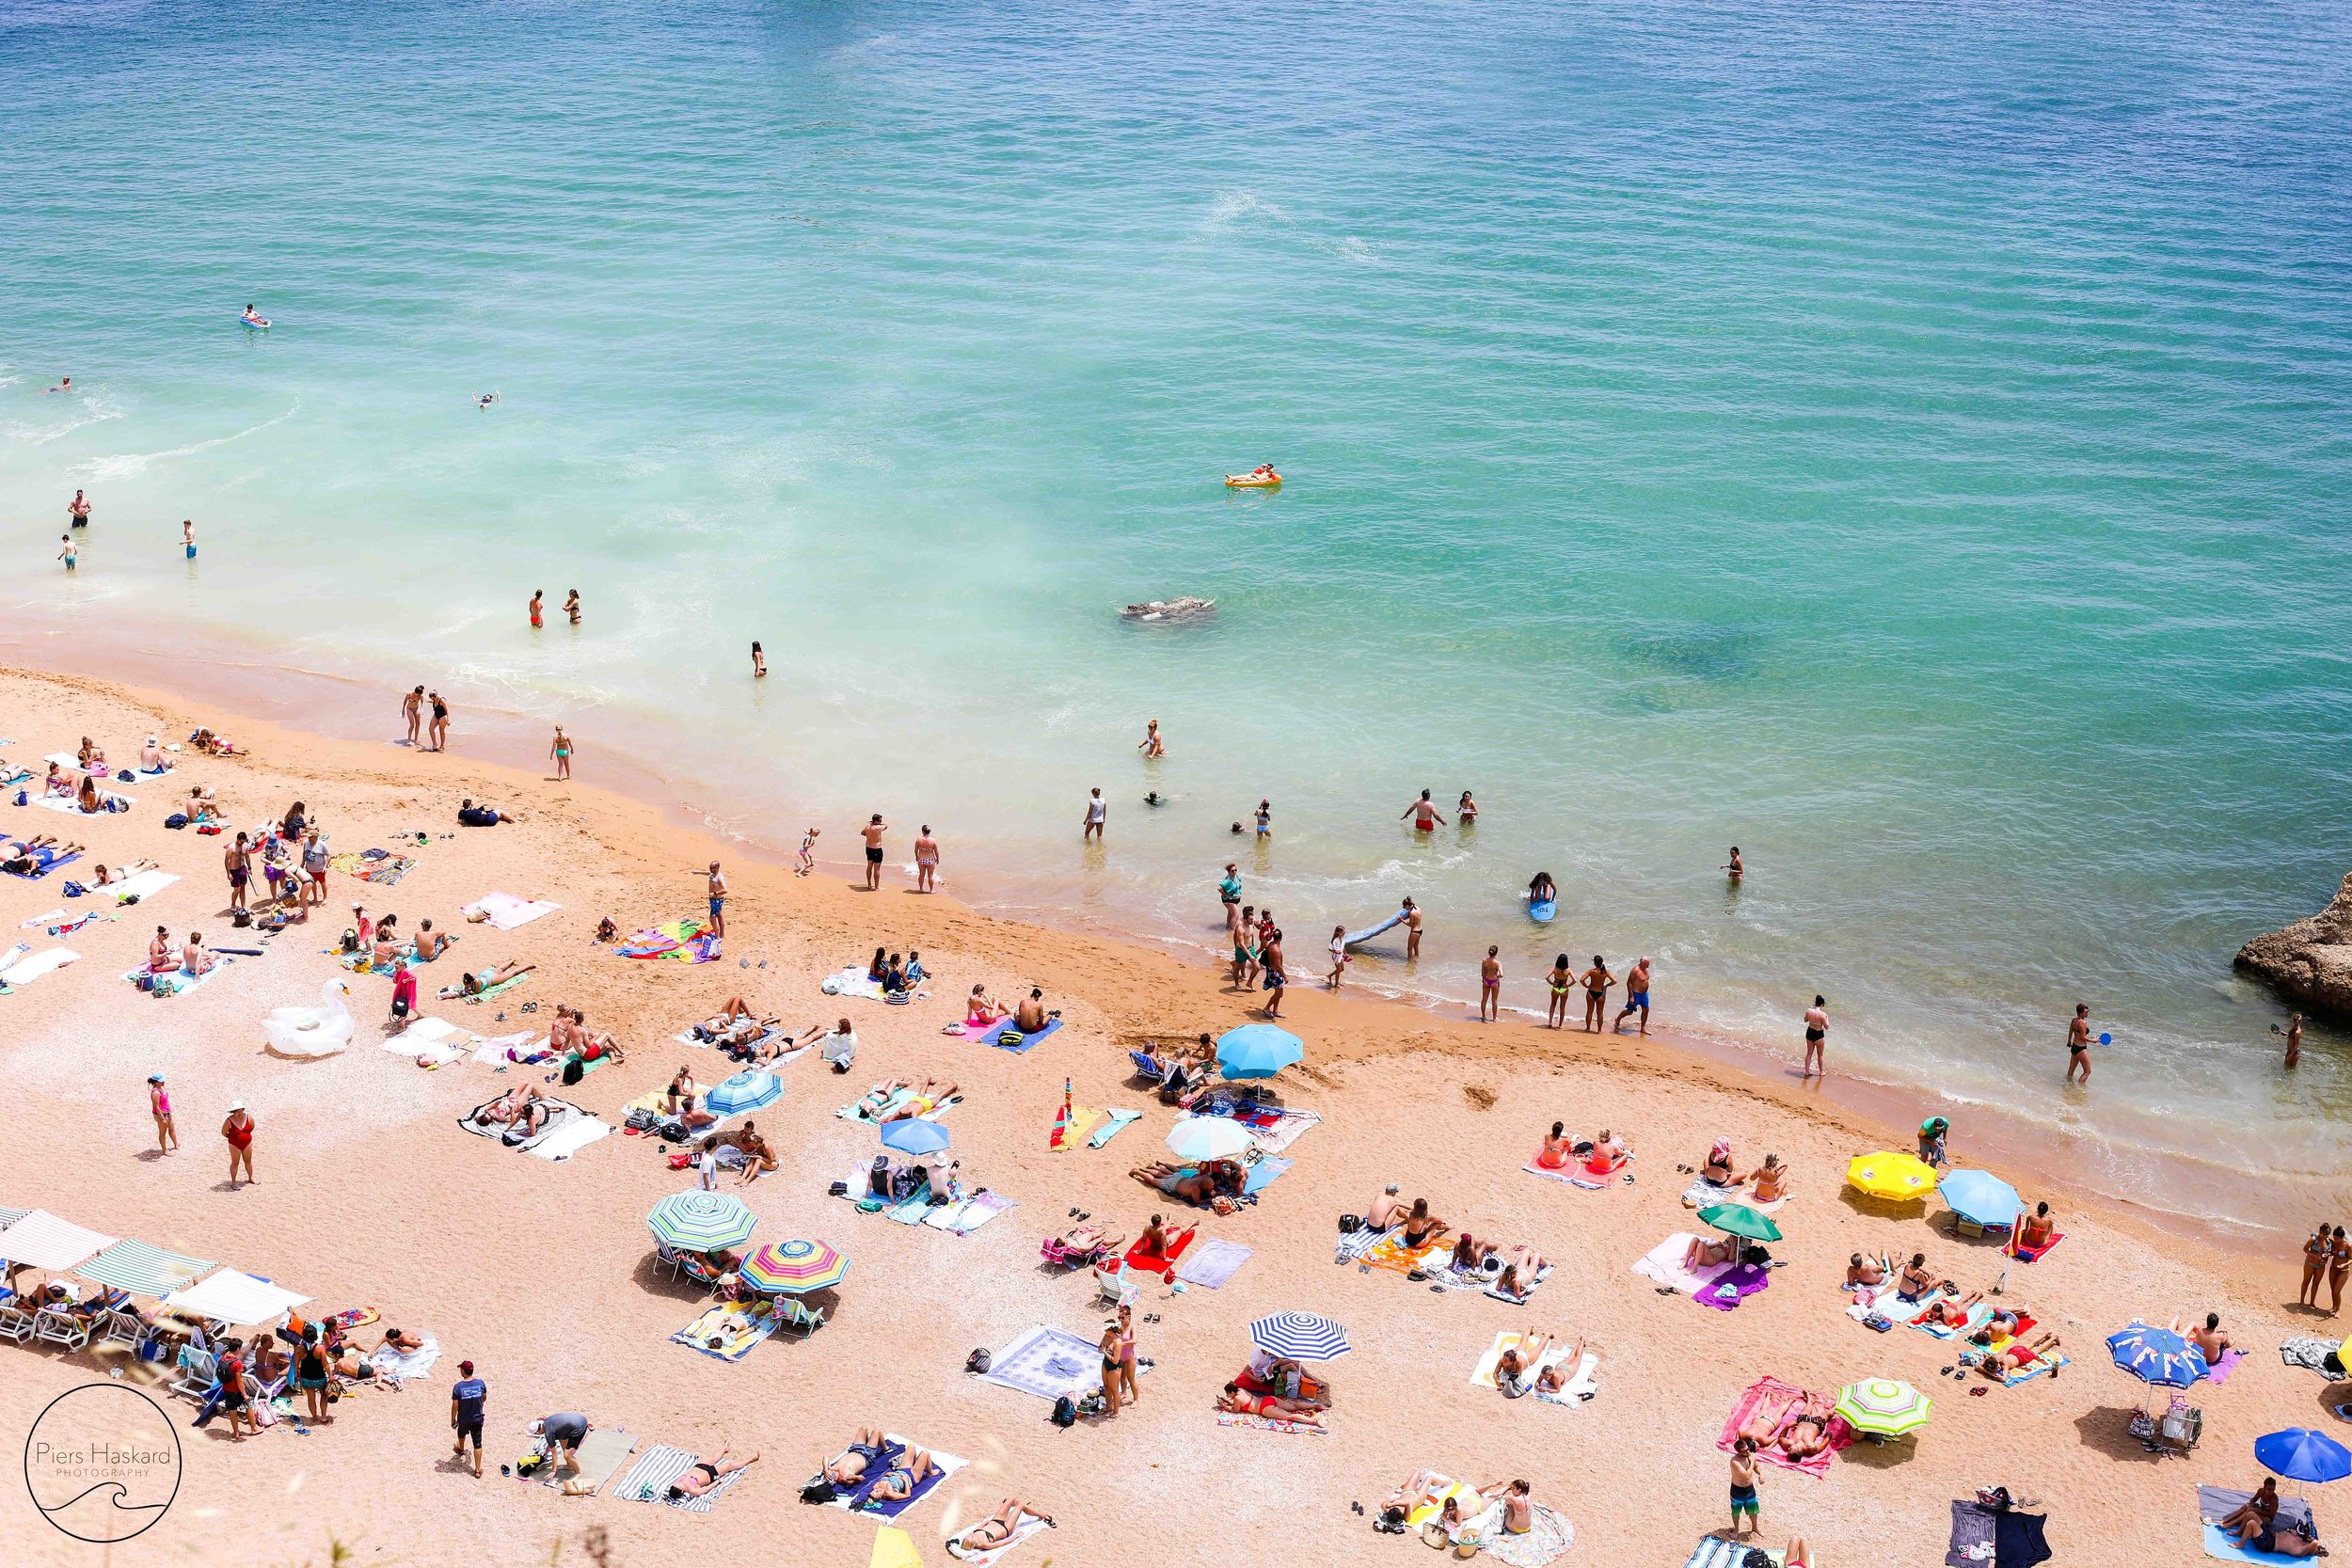 Portuguese Beach Scene Piers Haskard